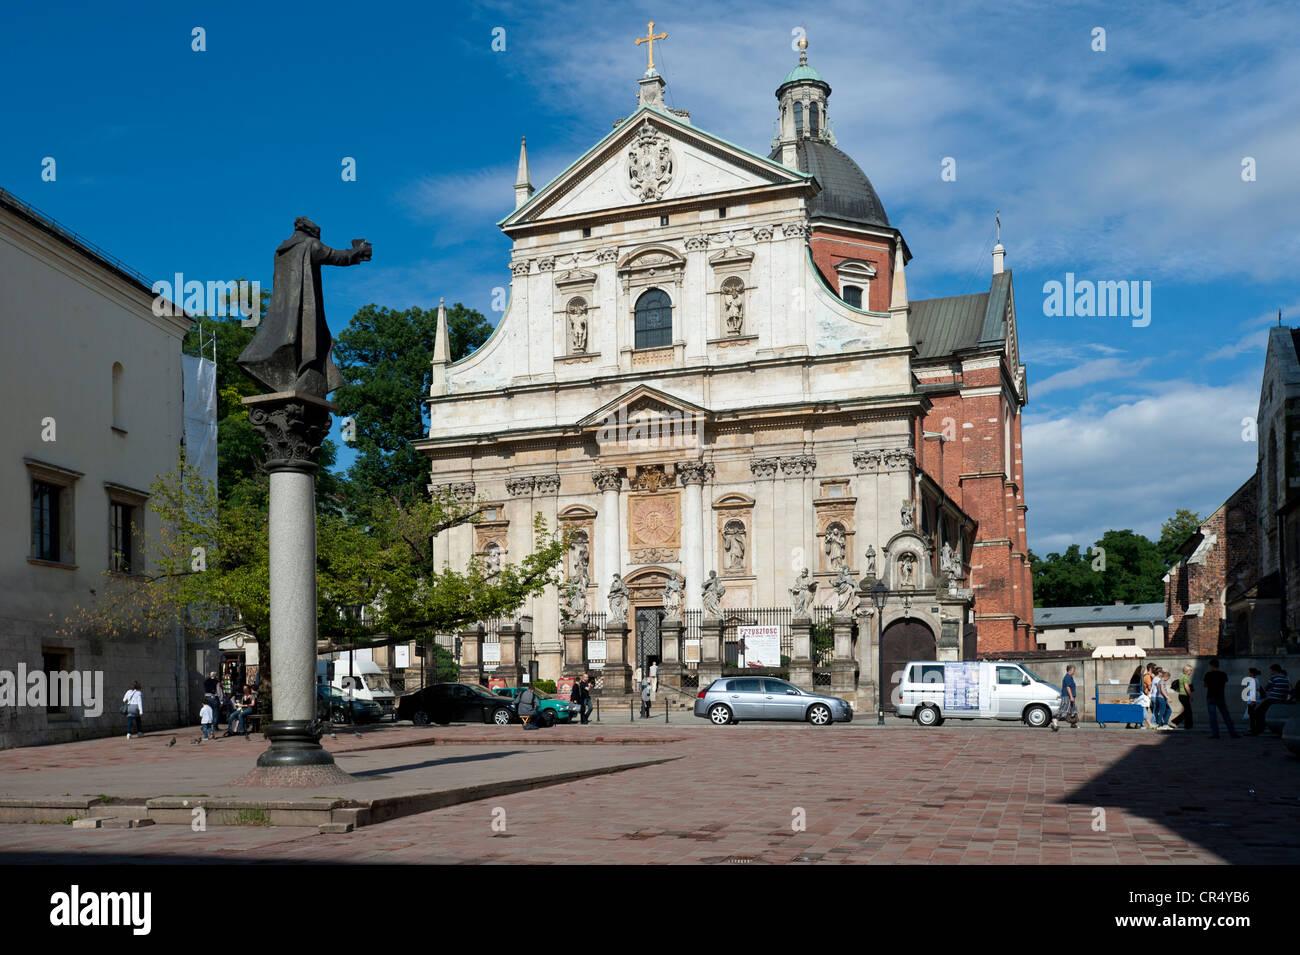 St. Peter and Paul Church, Krakow, Malopolska, Poland, Europe - Stock Image